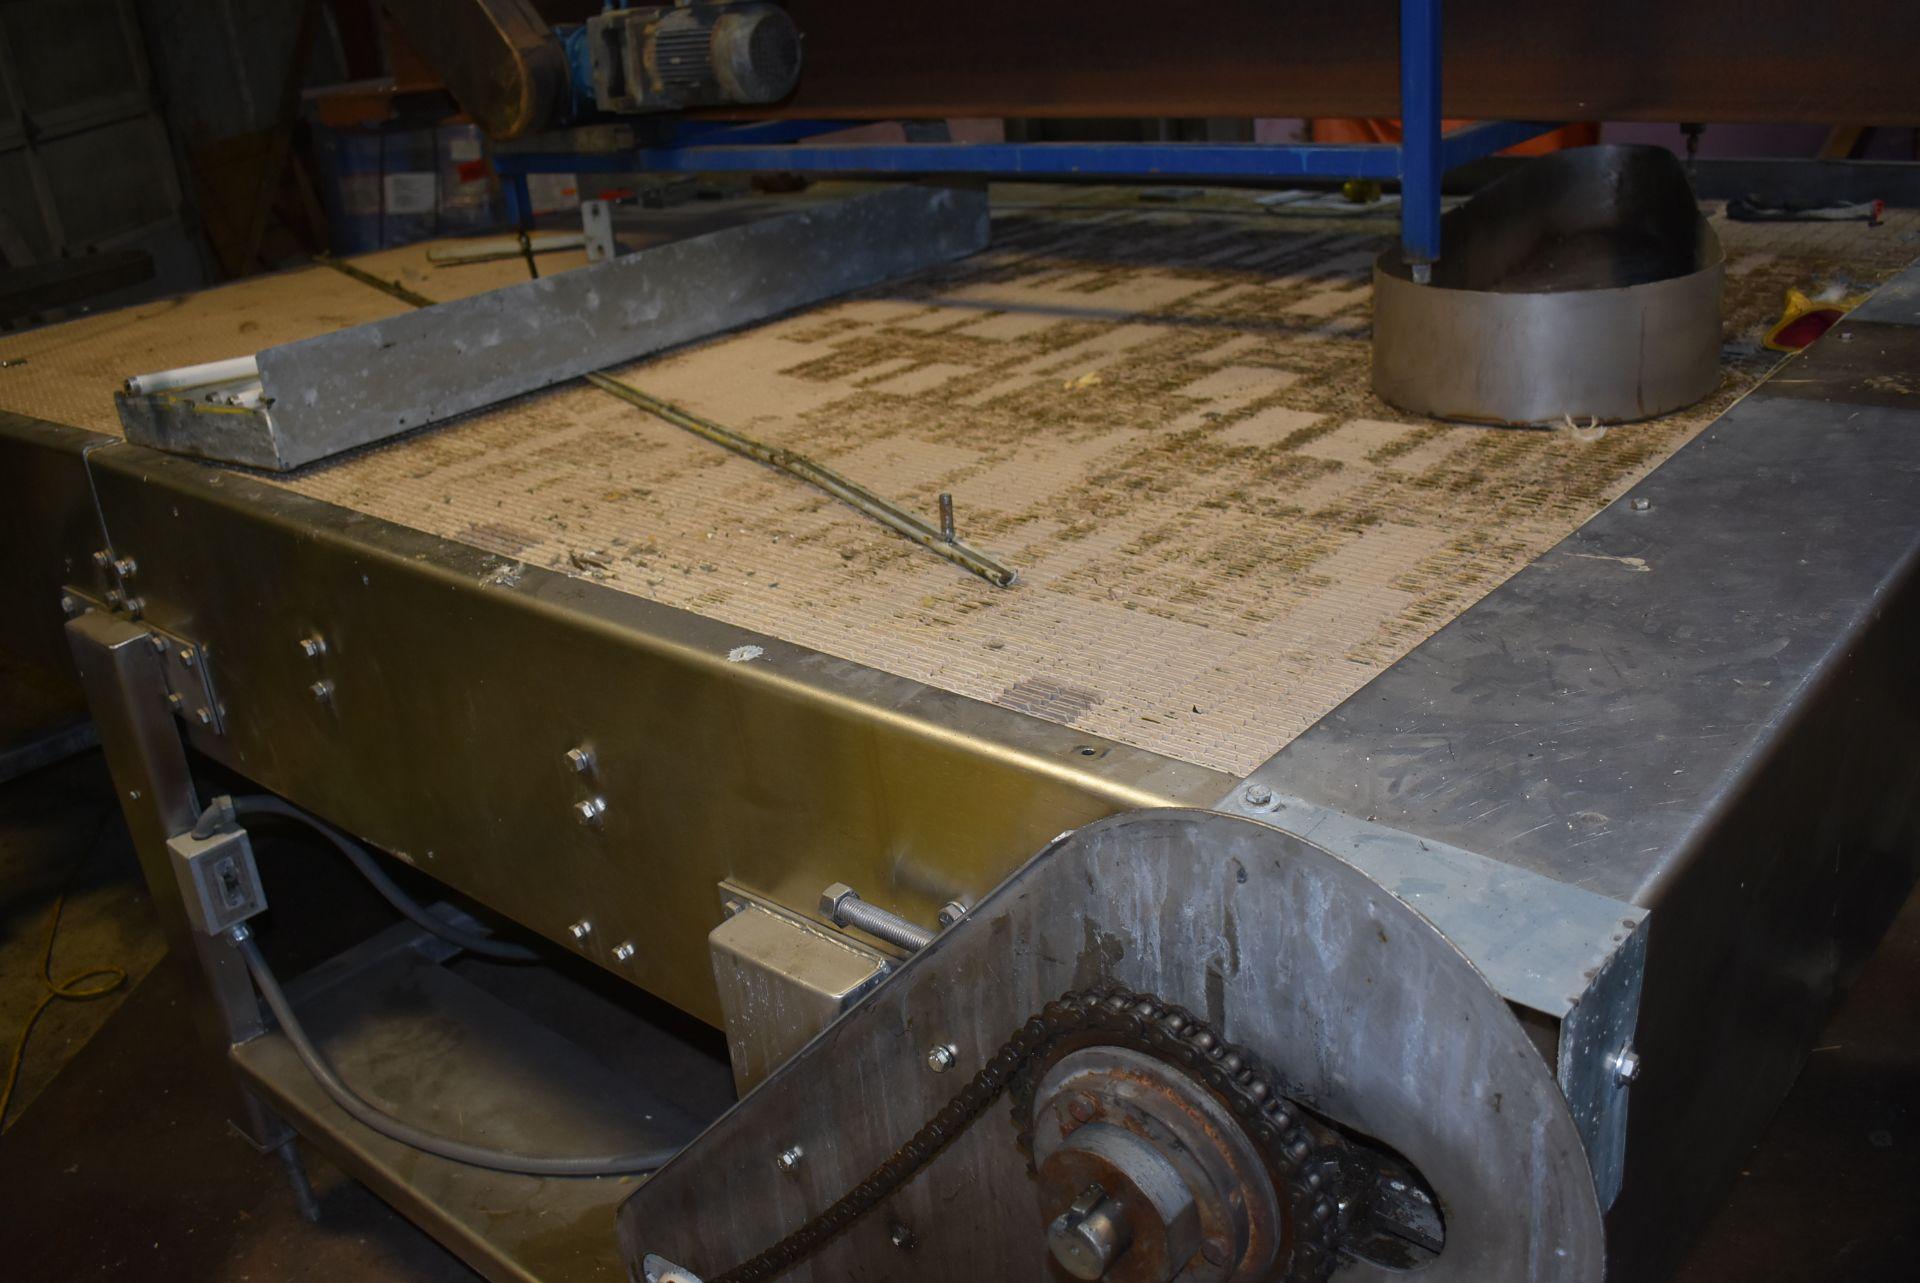 Motorized Belt Conveyor/Accumulation Table, 10' x 8' - Image 3 of 3